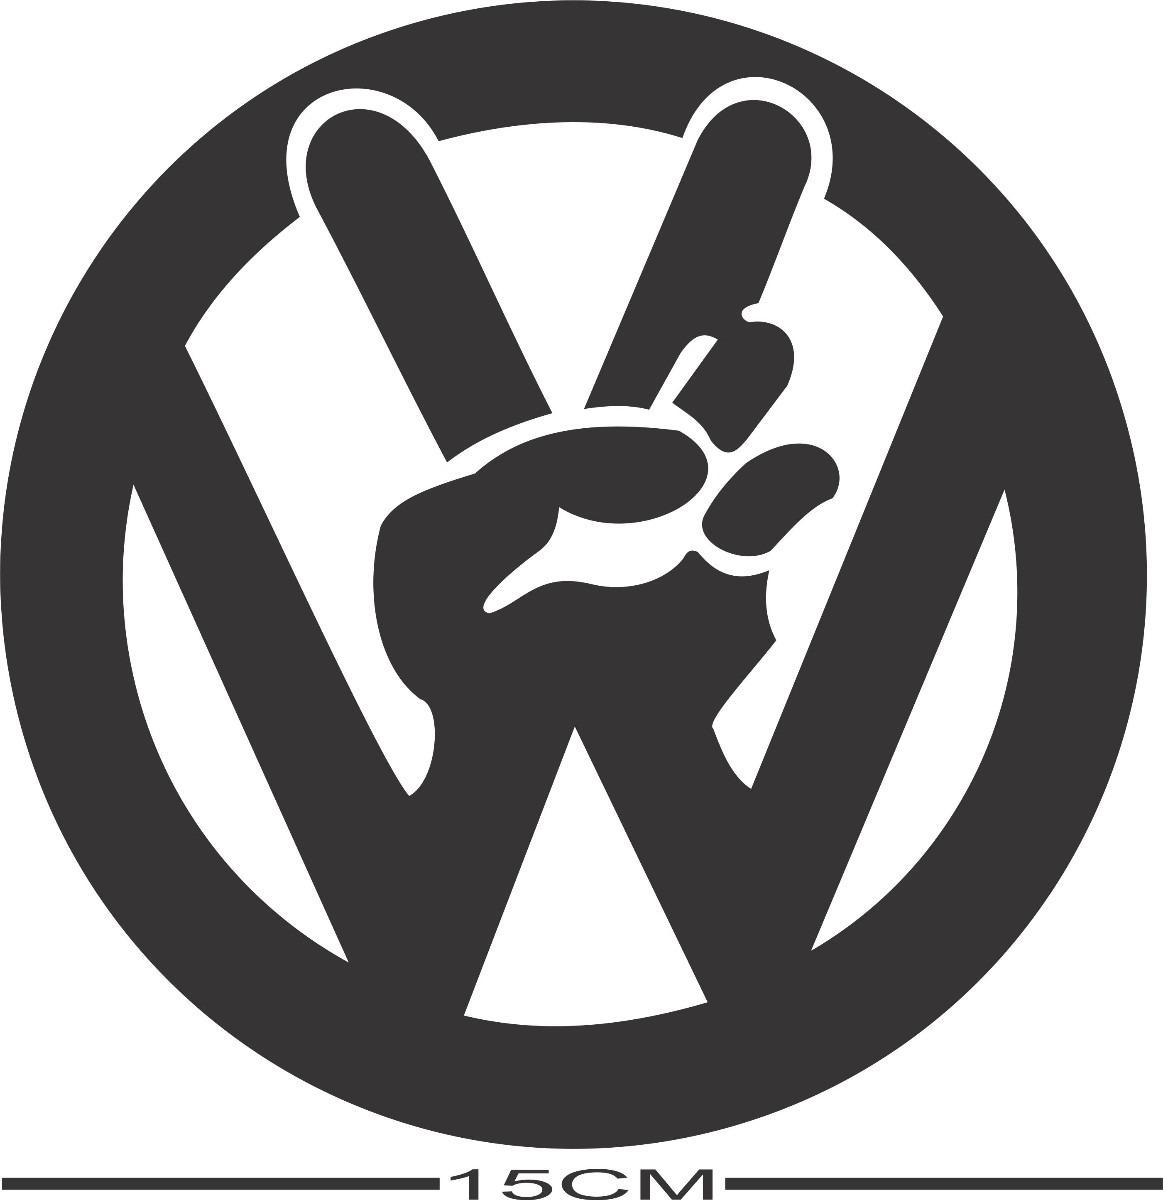 Adesivo Decorativo Automotivo S 237 Mbolo Volkswagen Paz R